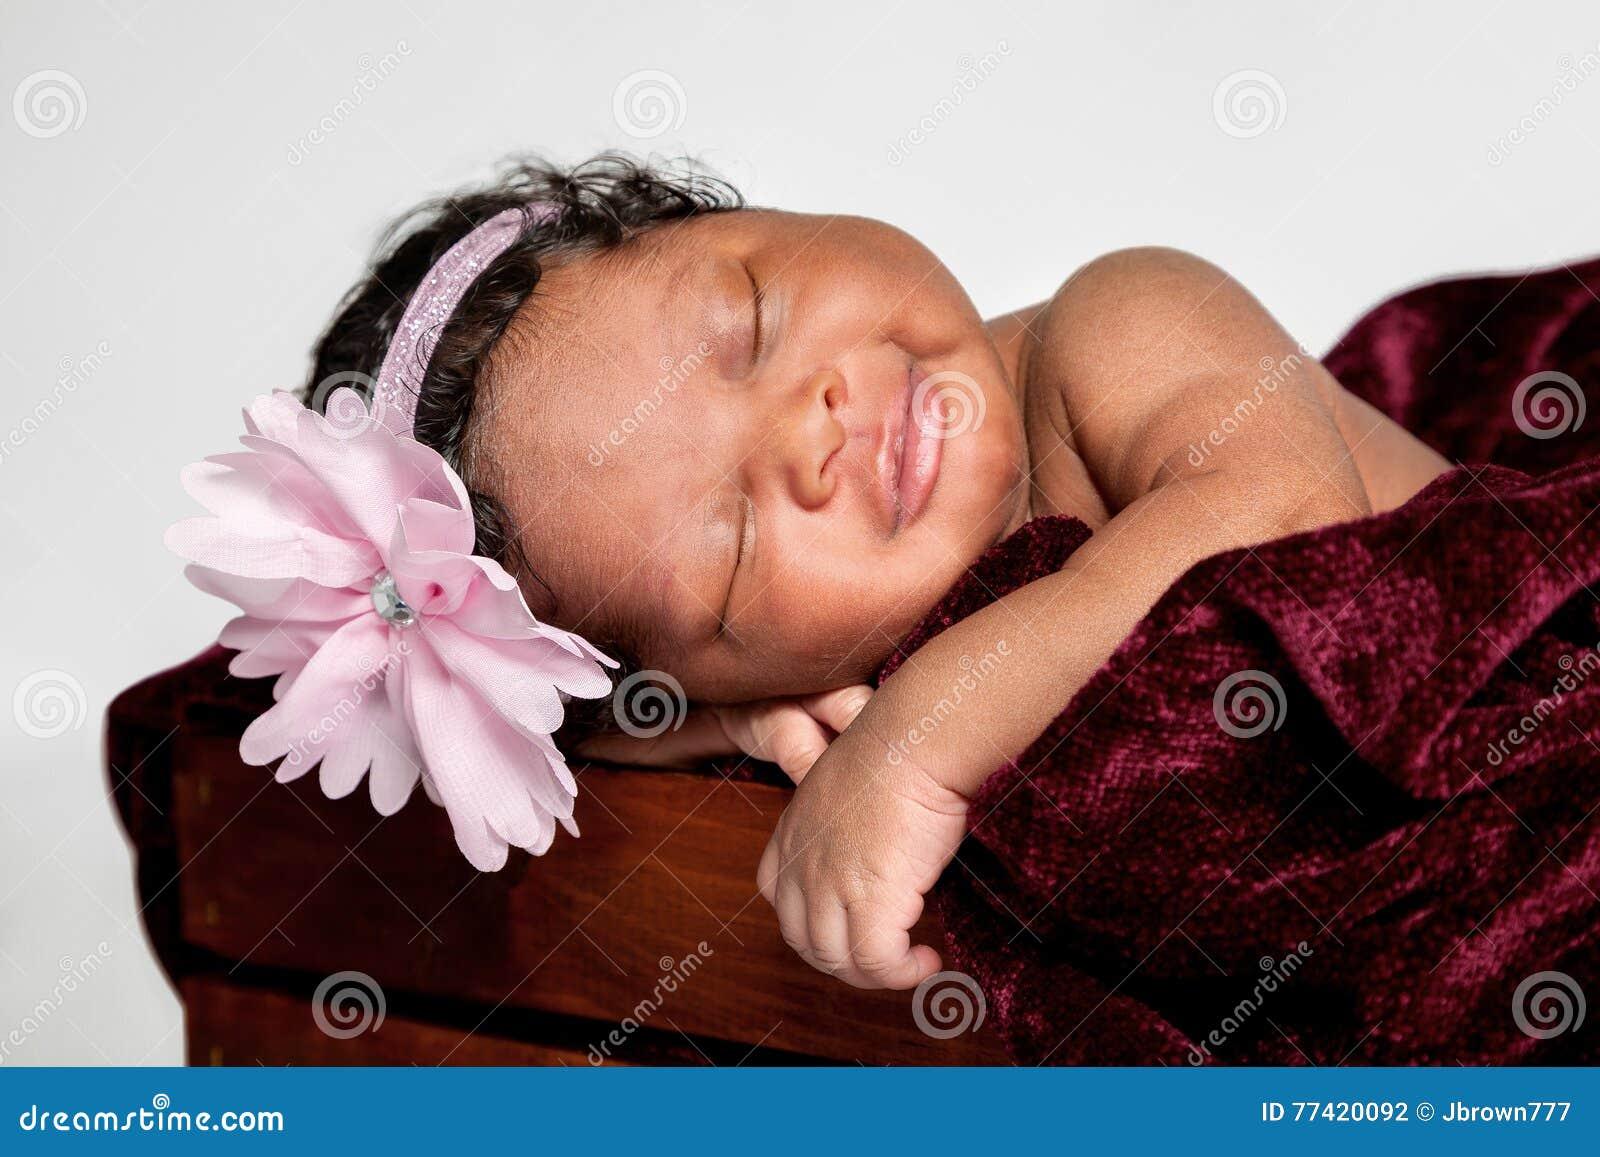 Bebé afroamericano dulce dormido en un cajón de madera